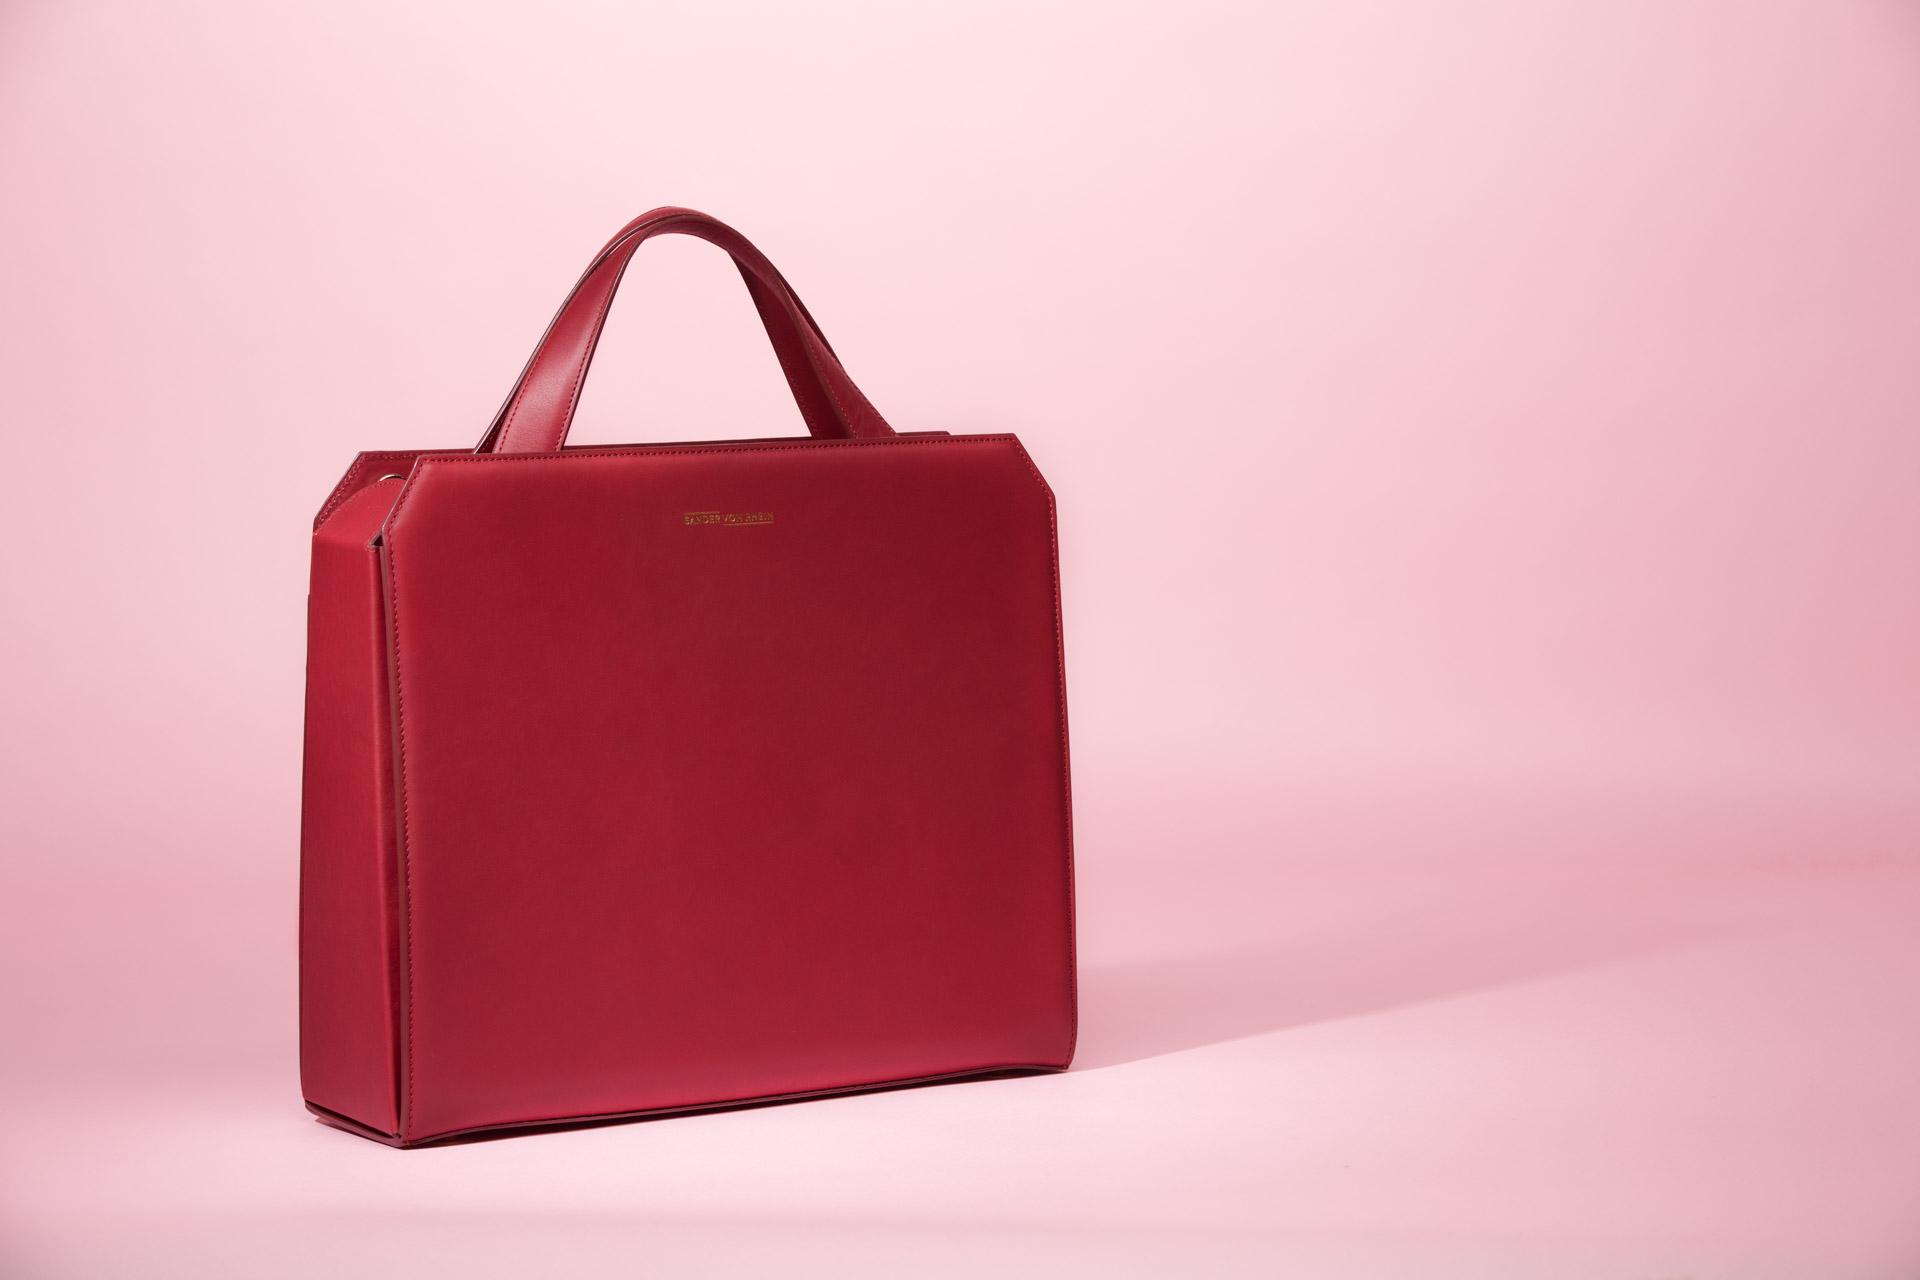 WEB Backup bags shop presentation-64.jpg